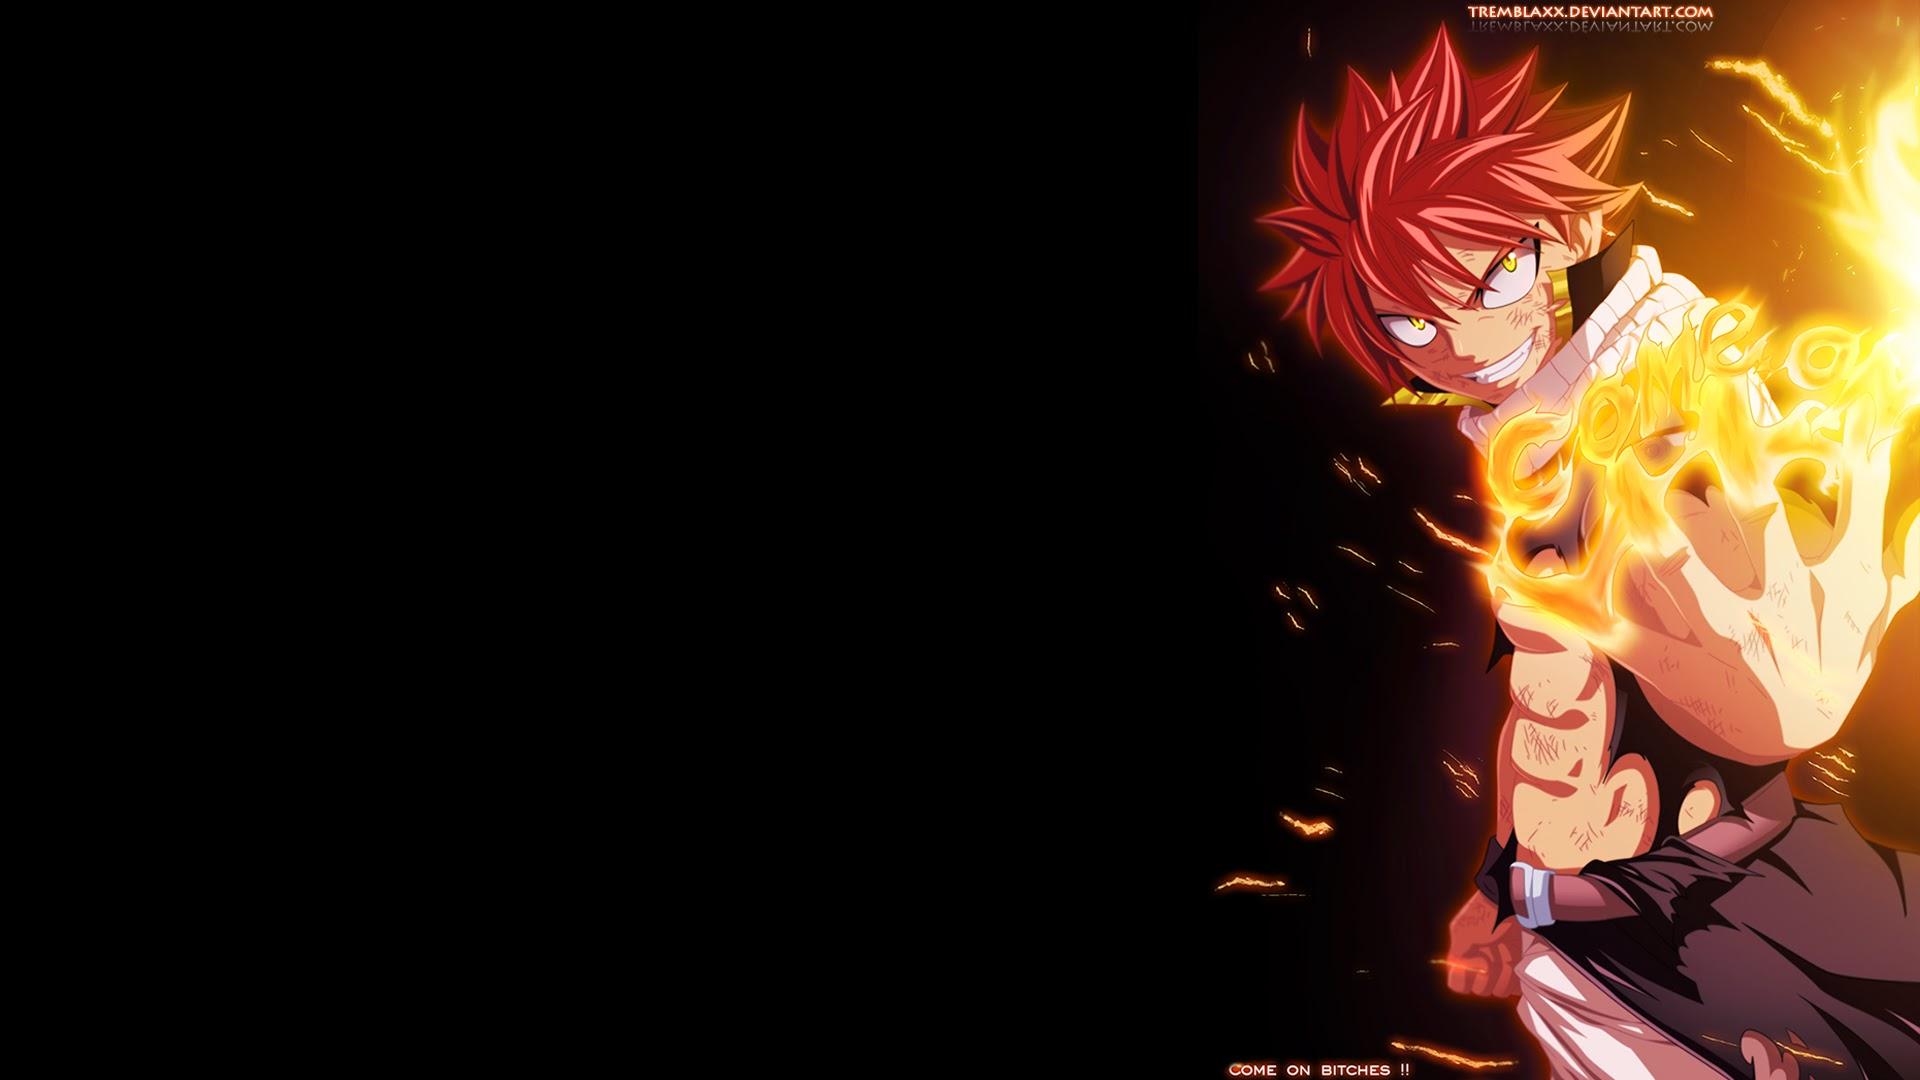 Fairy Tail Anime Natsu 8p Wallpaper HD 1920x1080